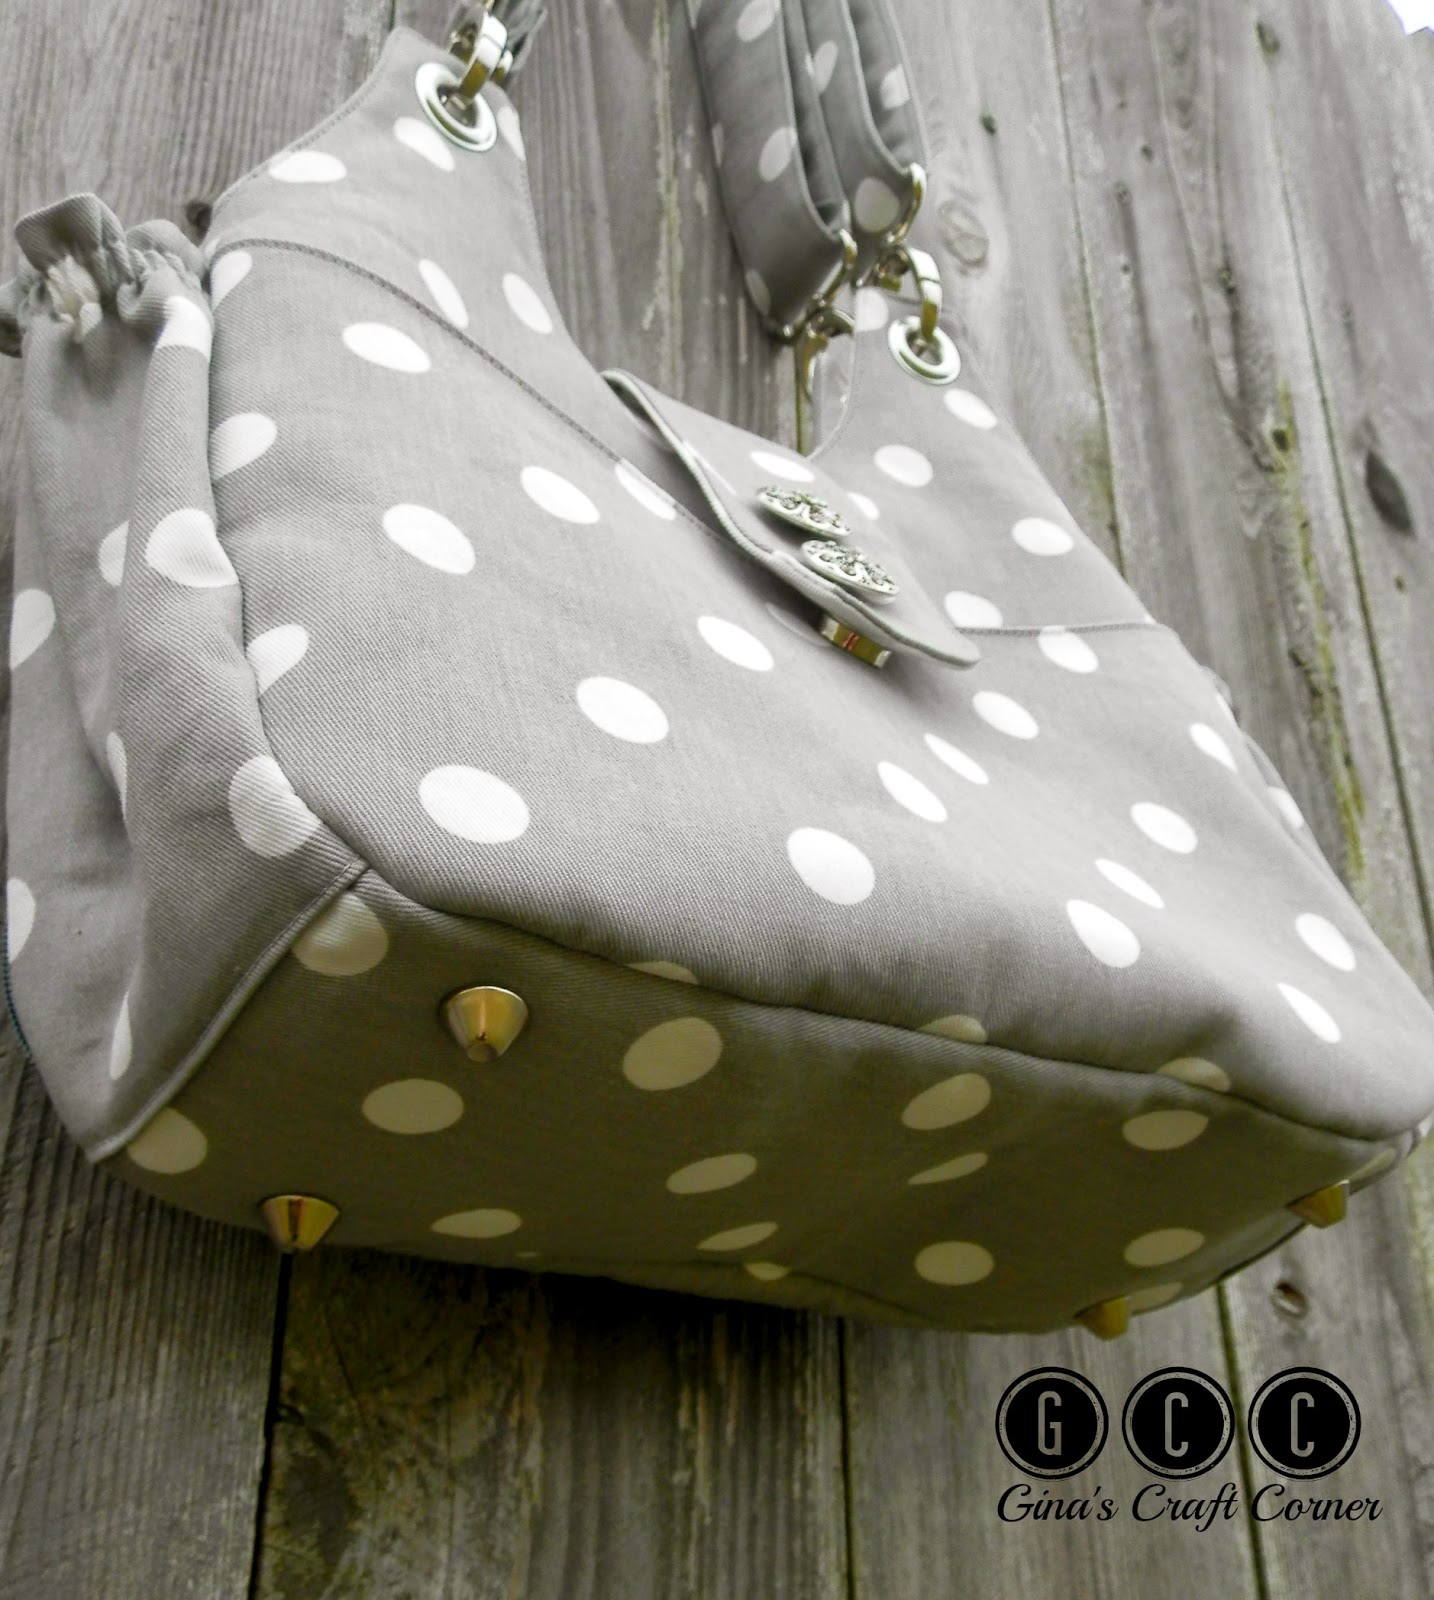 How to add purse feet to handbags by GCC (Gina's Craft Corner)